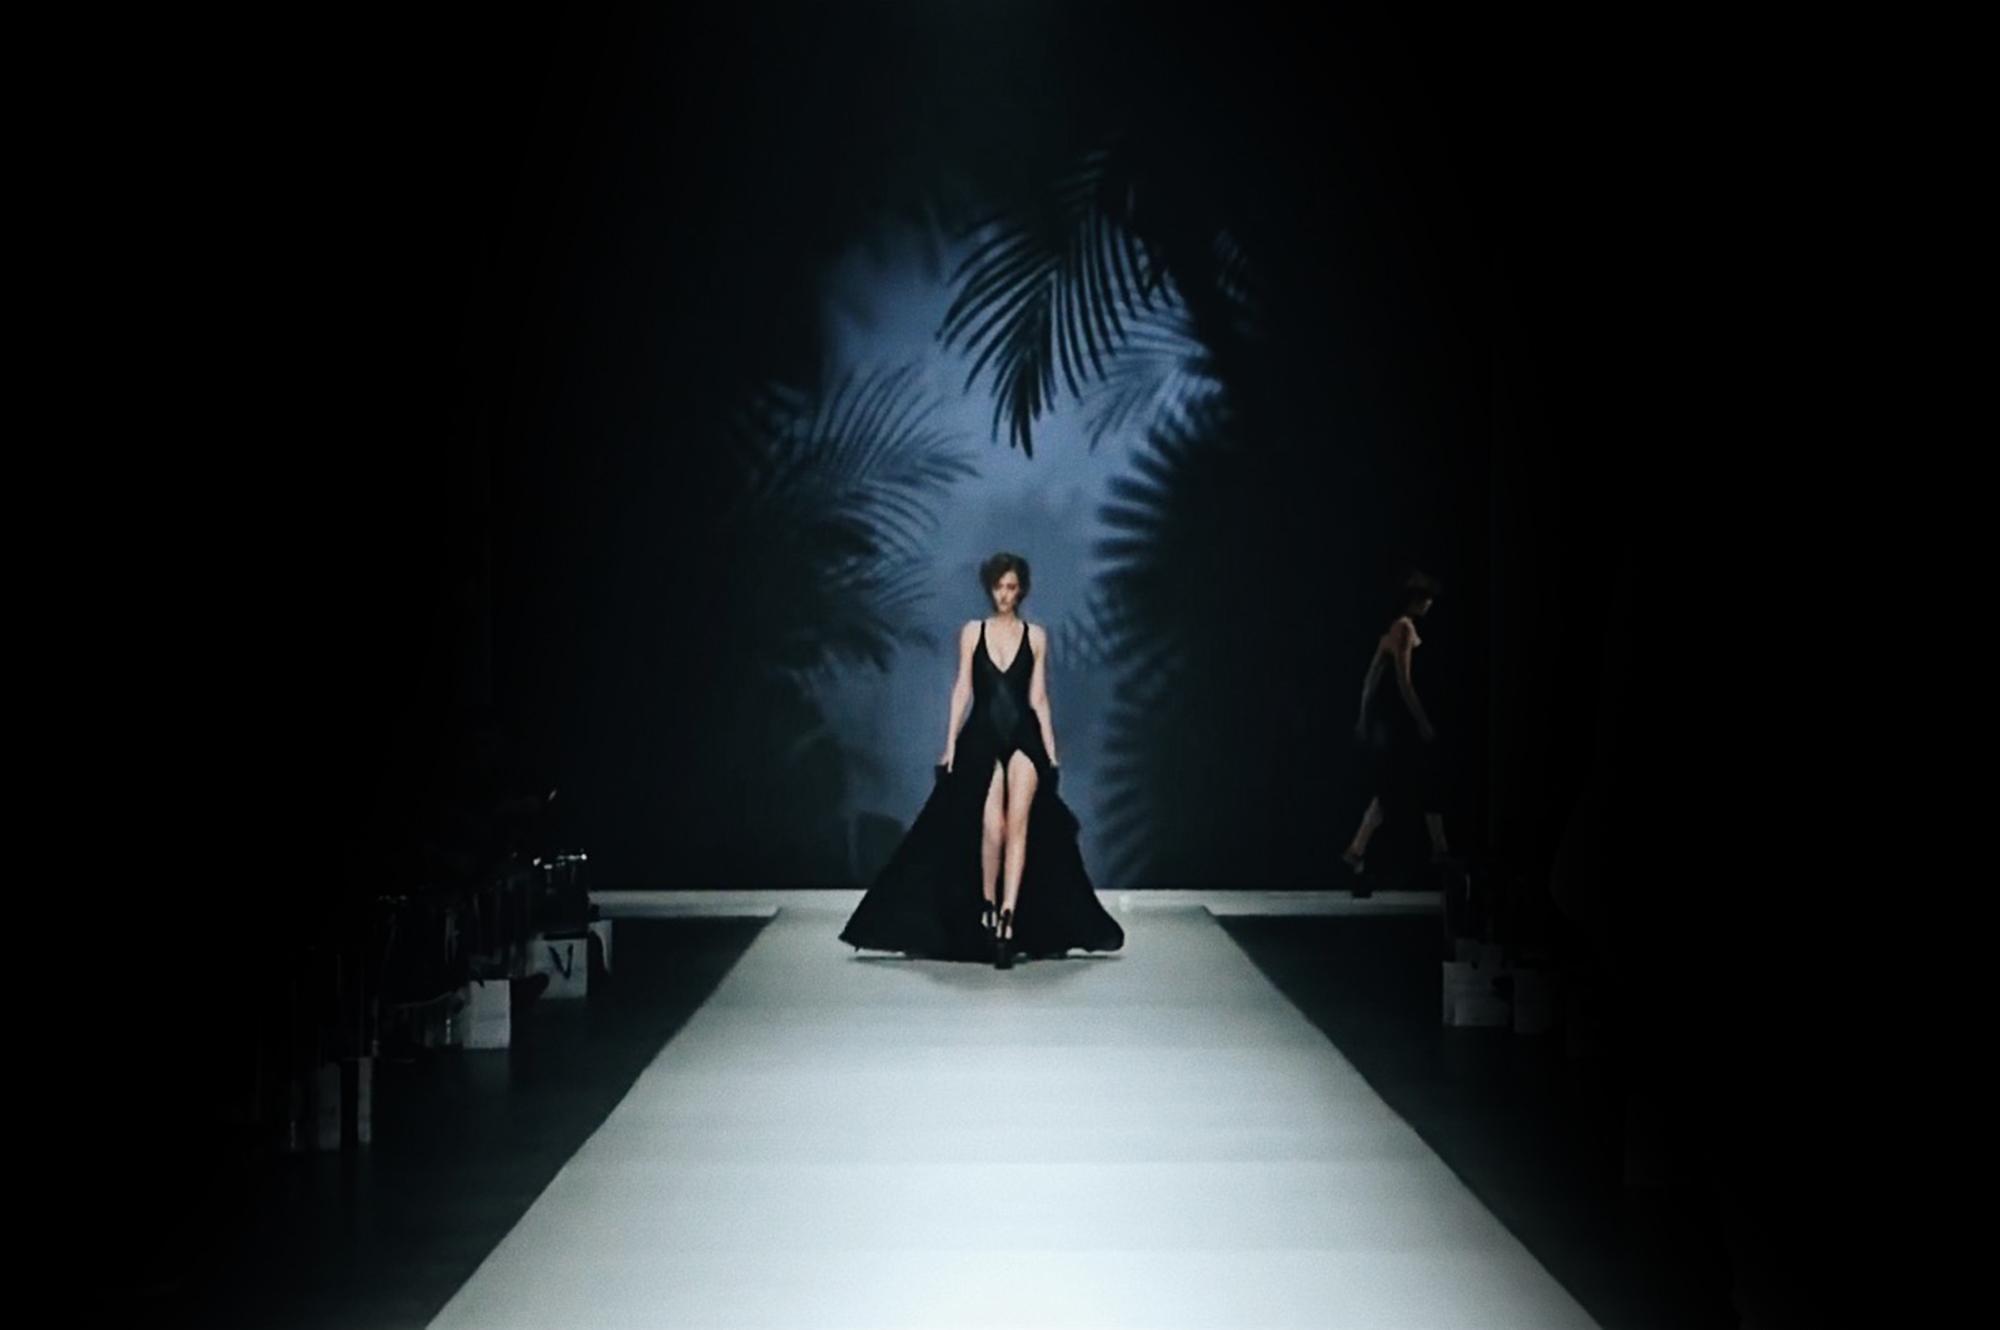 Asphalt Jungle Fashion Show by Dennis Diem, Backdrop Visuals Daan Colijn